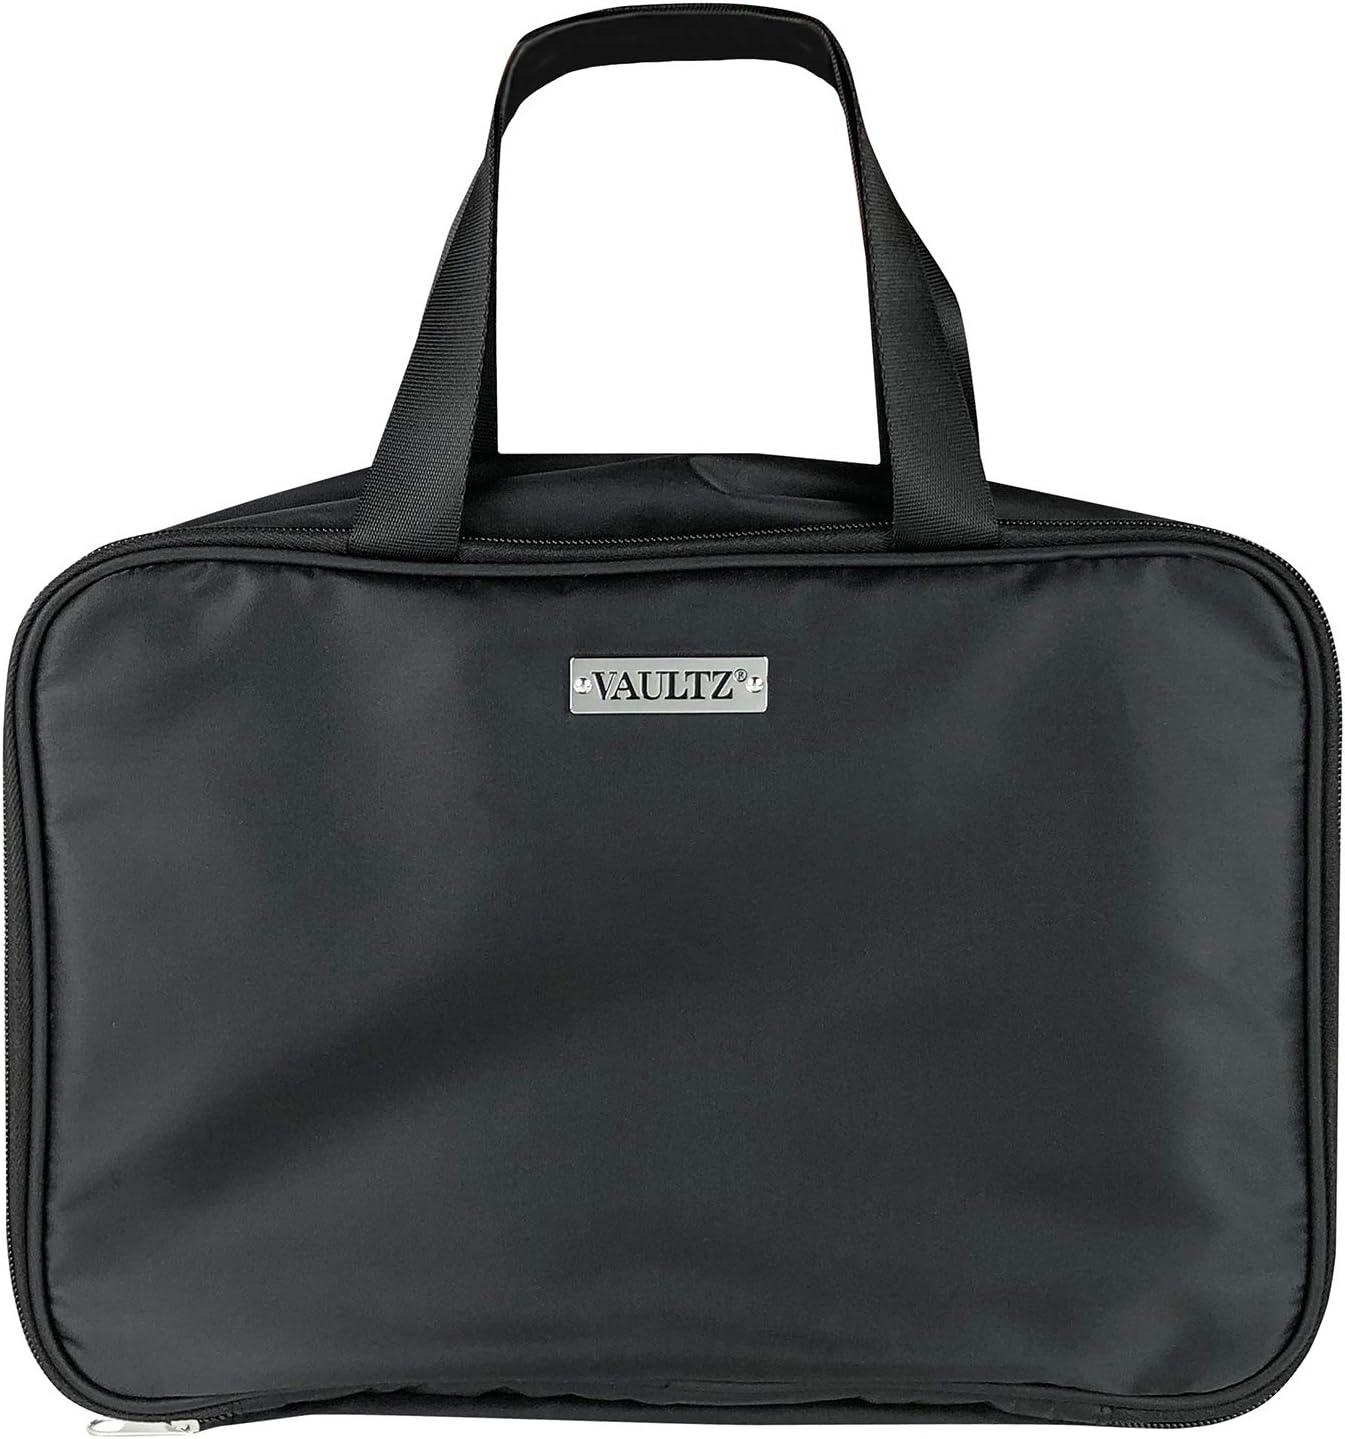 Vaultz Hanging Travel Bag with Interior Compartments, Black, VZ03896